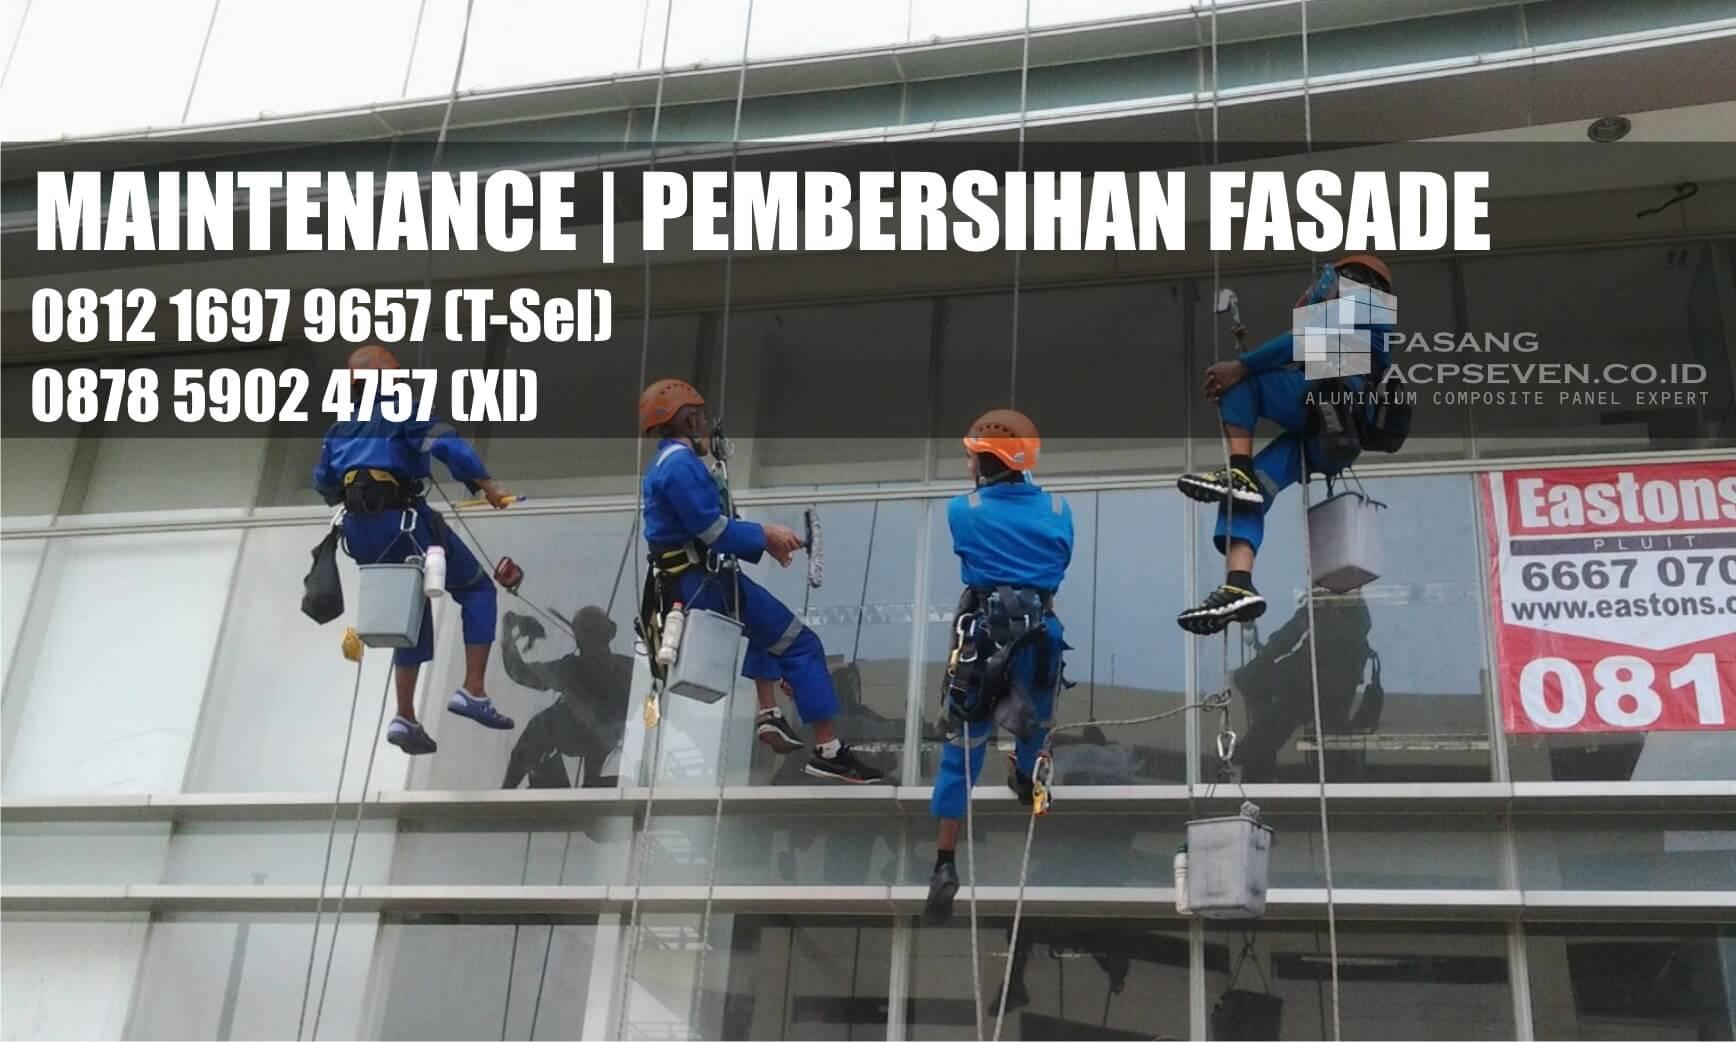 jasa bersih kaca gedung surabaya, maintenance fasade gedung, pembersihan fasade gedung surabaya